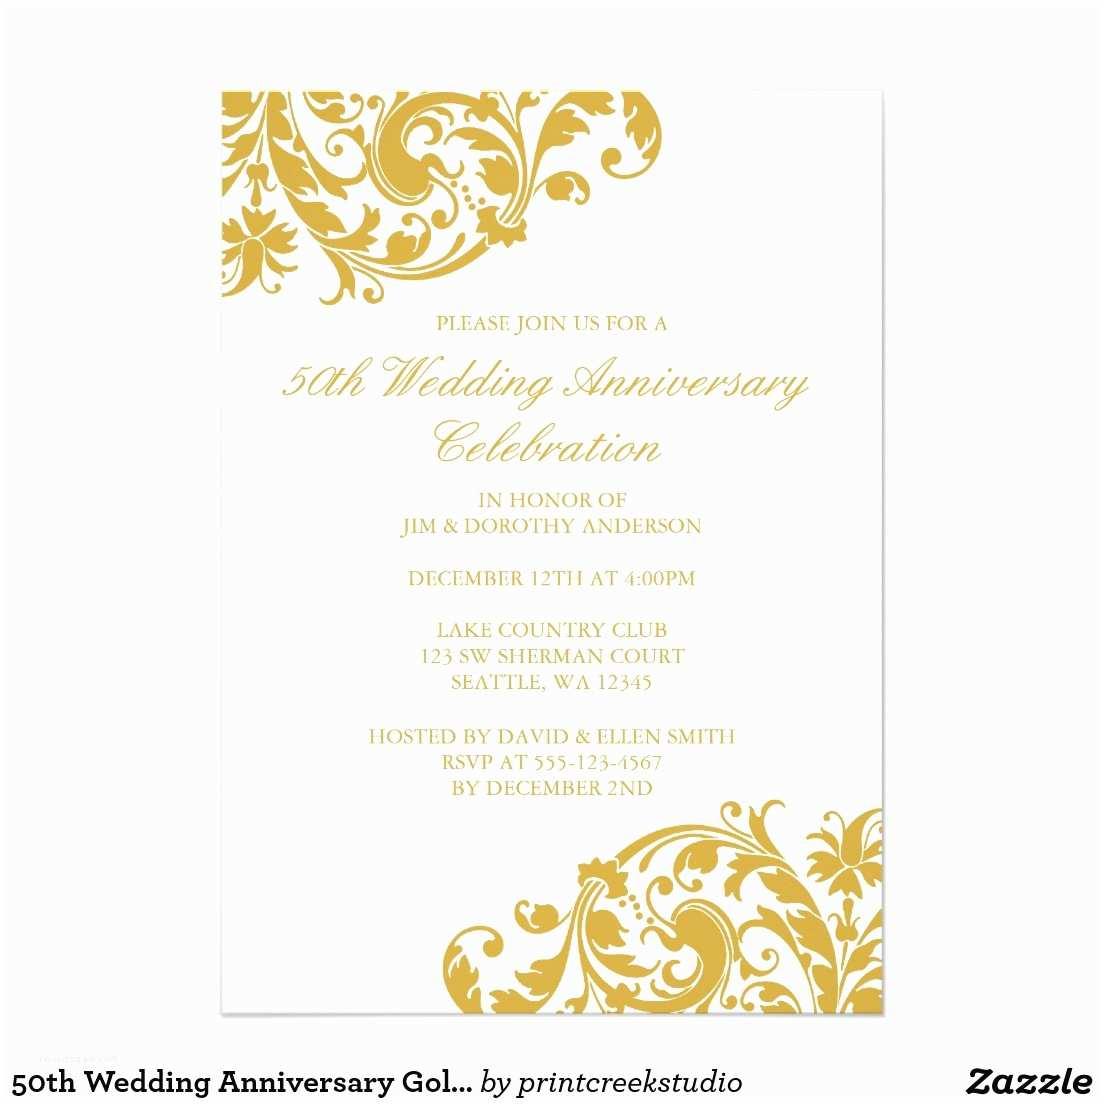 Vistaprint 50th Wedding Anniversary Invitations Zazzle 50th Wedding Anniversary Invitations Various